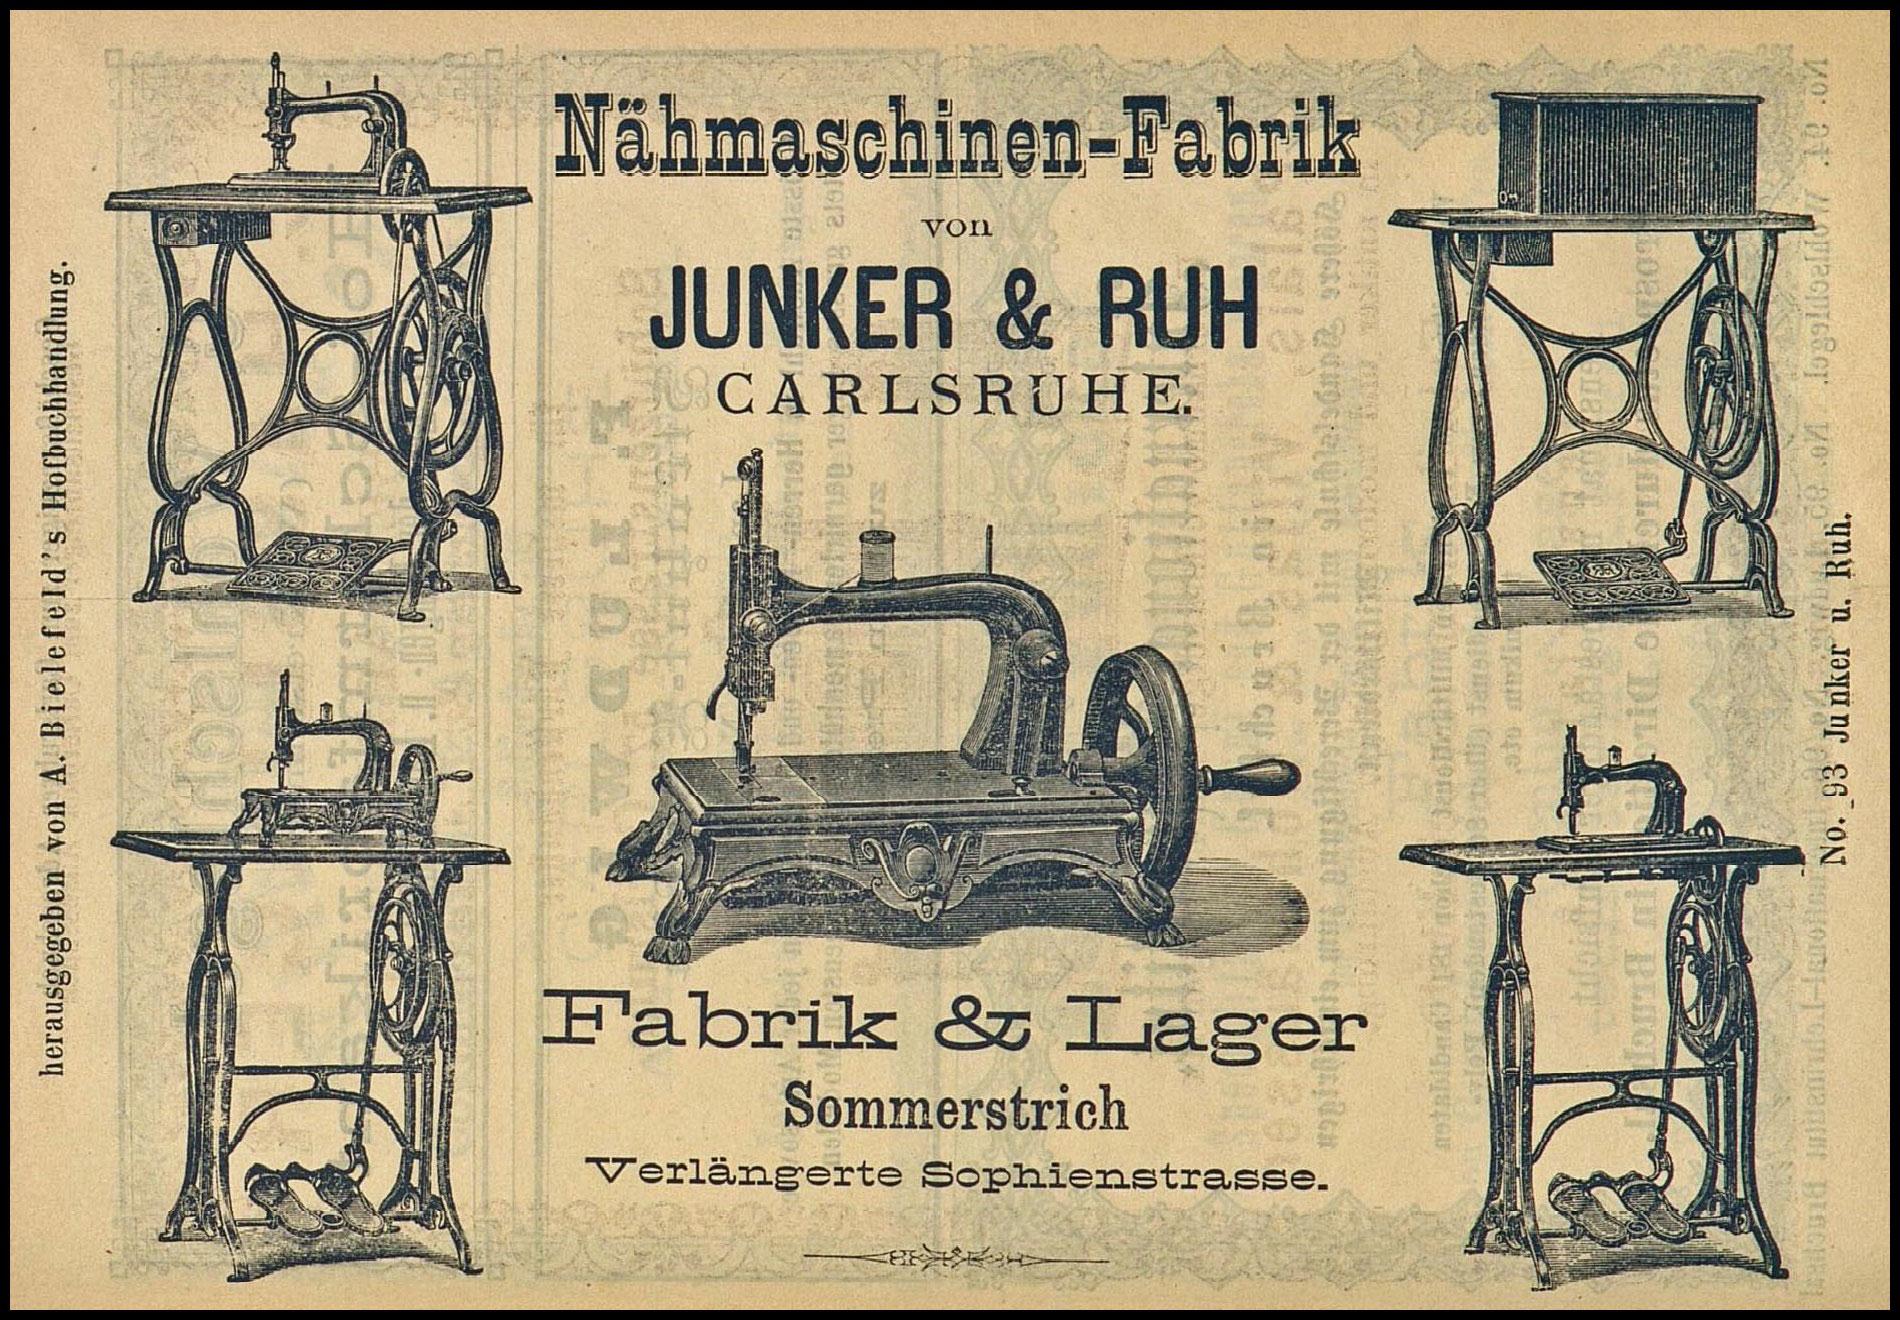 Junker & Ruh Sewing Machines - Fiddlebase